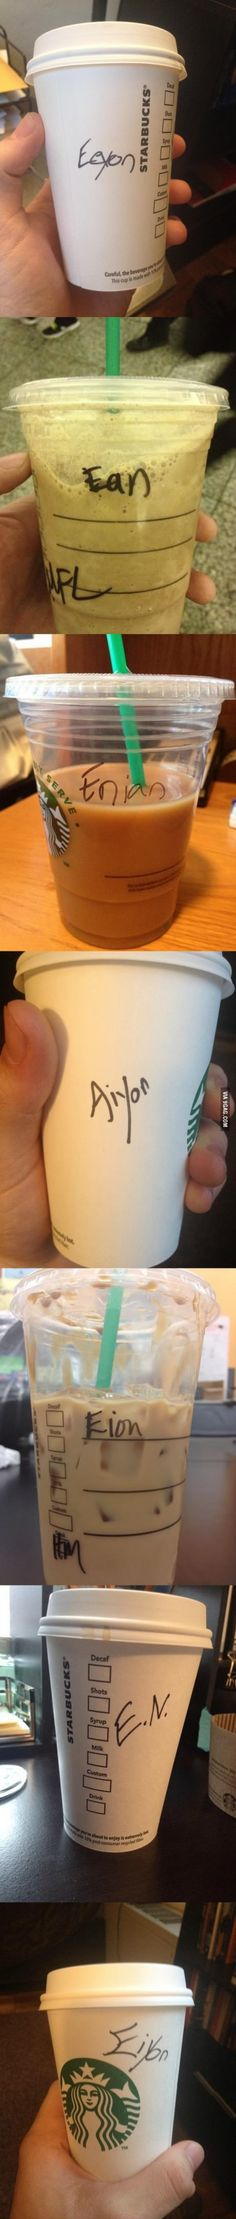 My Name Is Ian And I Hate Starbucks